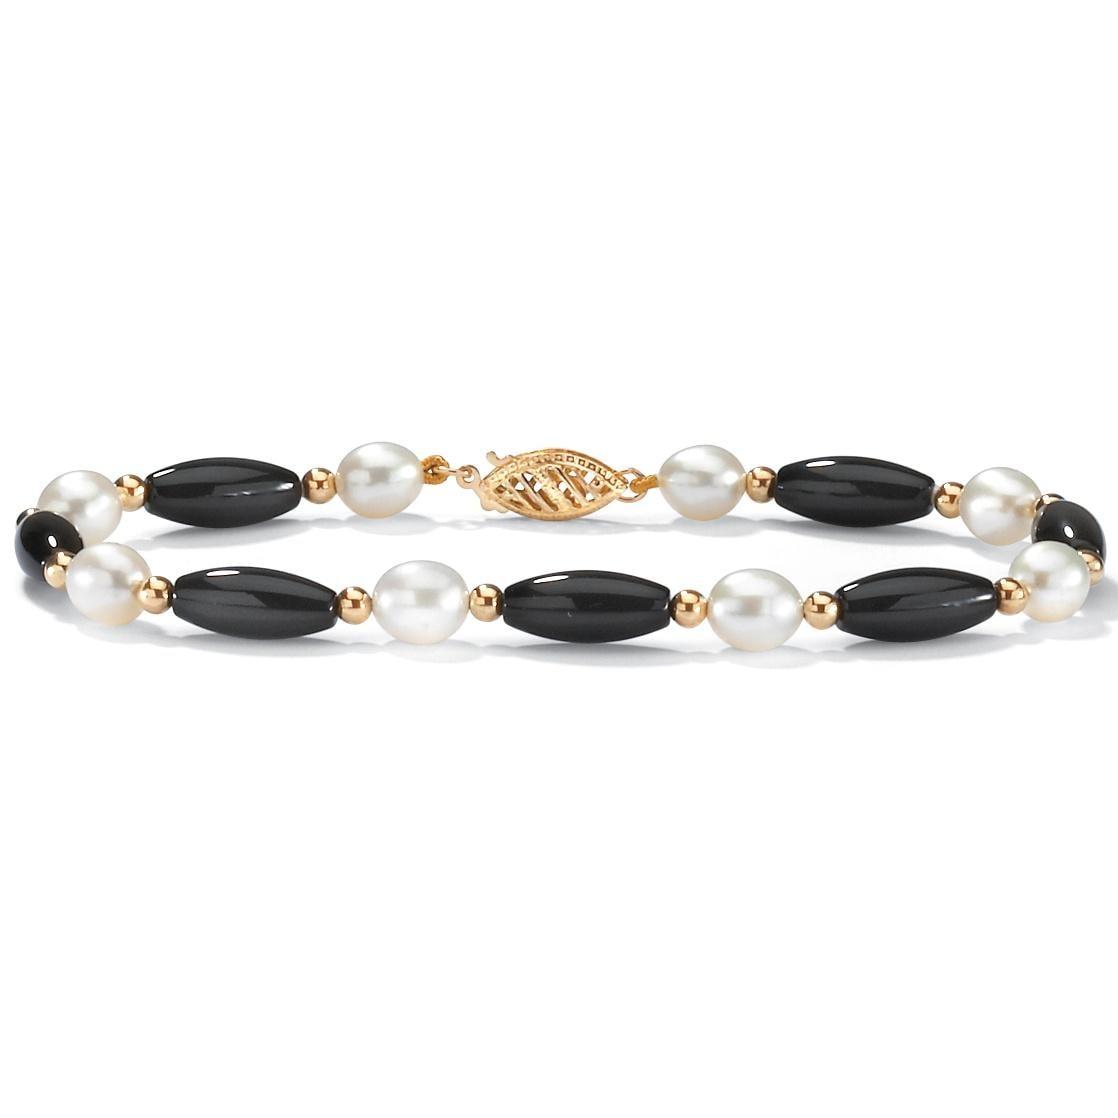 Angelina D'Andrea Onyx/Pearl Tube 7.5-inch Bracelet